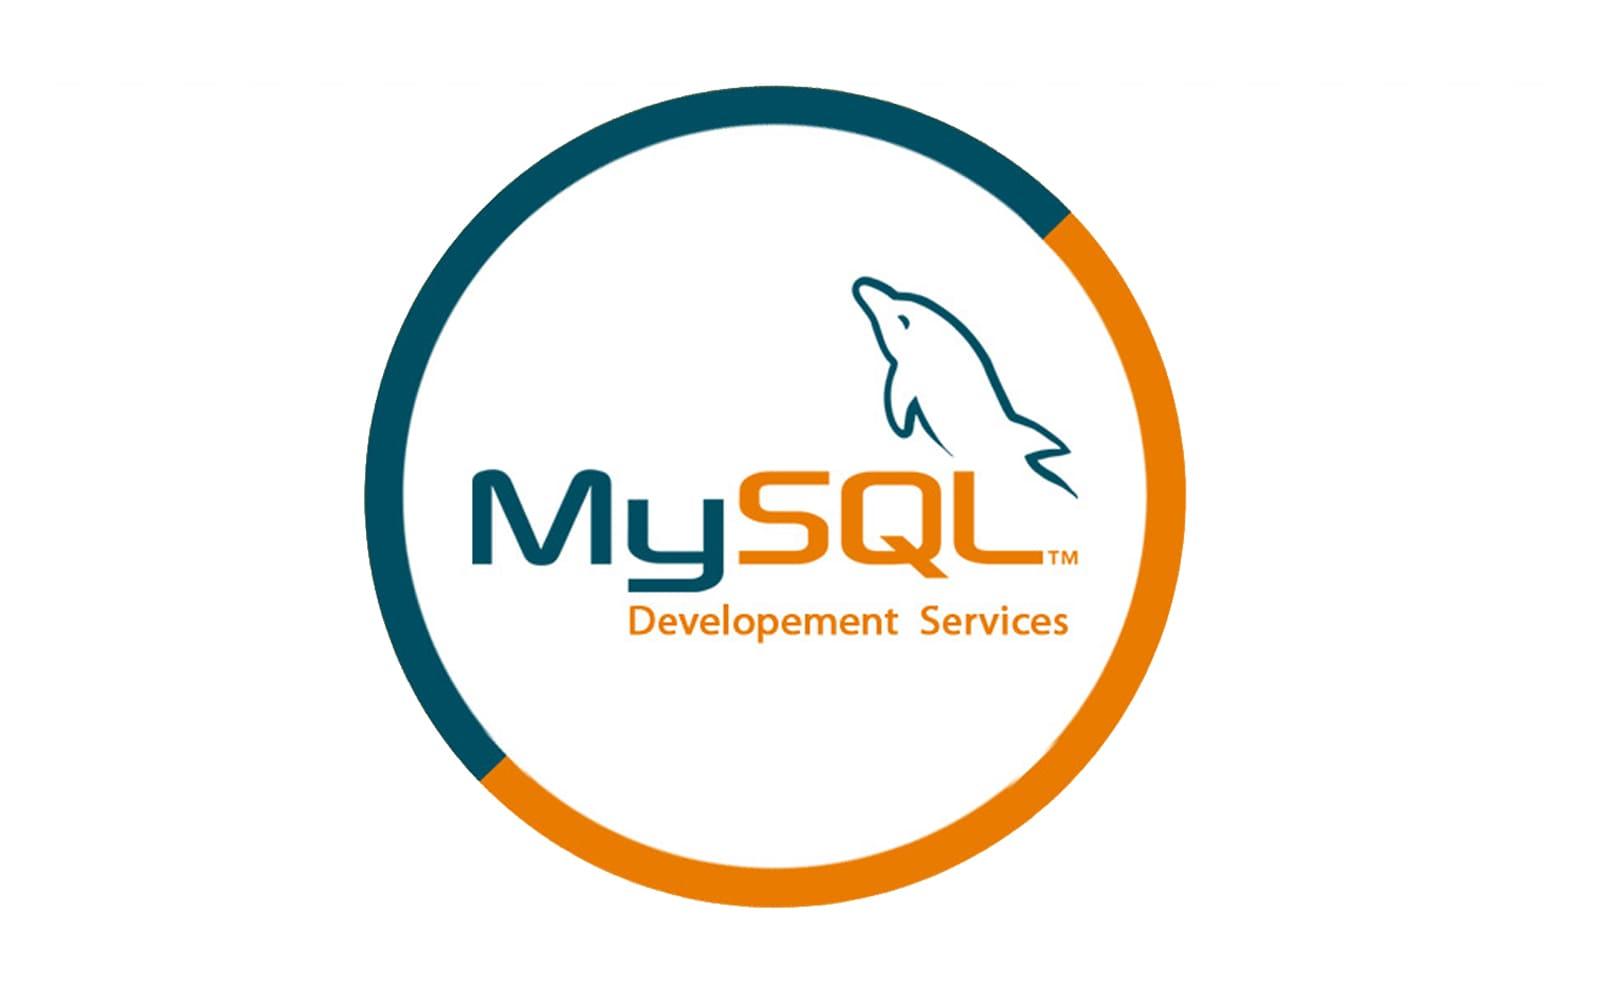 MySQL ngoại truyện